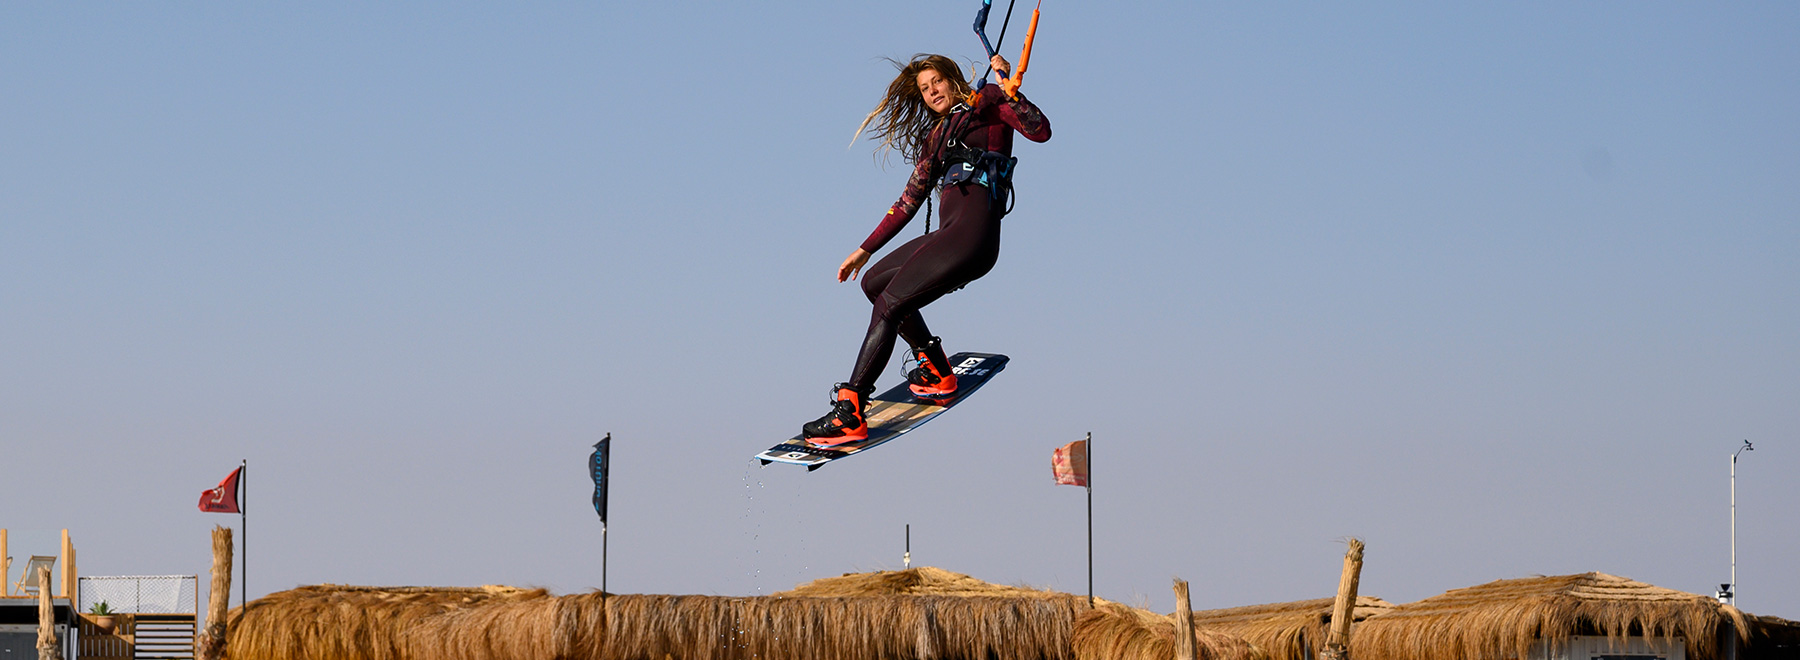 Kiteboarding-Events-El-Gouna-Makani